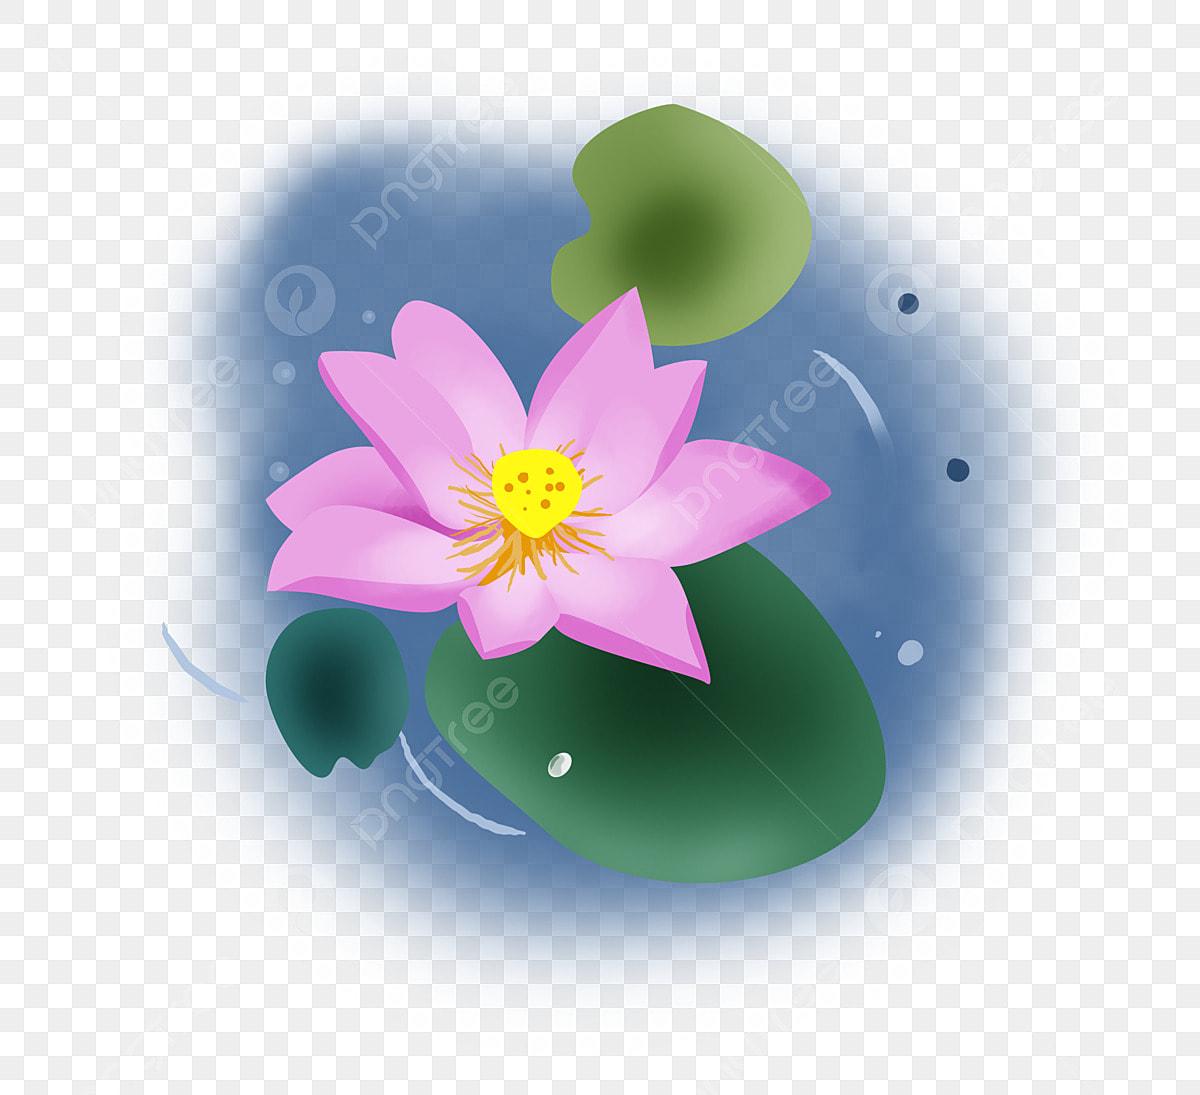 Modular Origami Lotus Flower Tutorial - DIY - Paper Kawaii - YouTube | 1088x1200